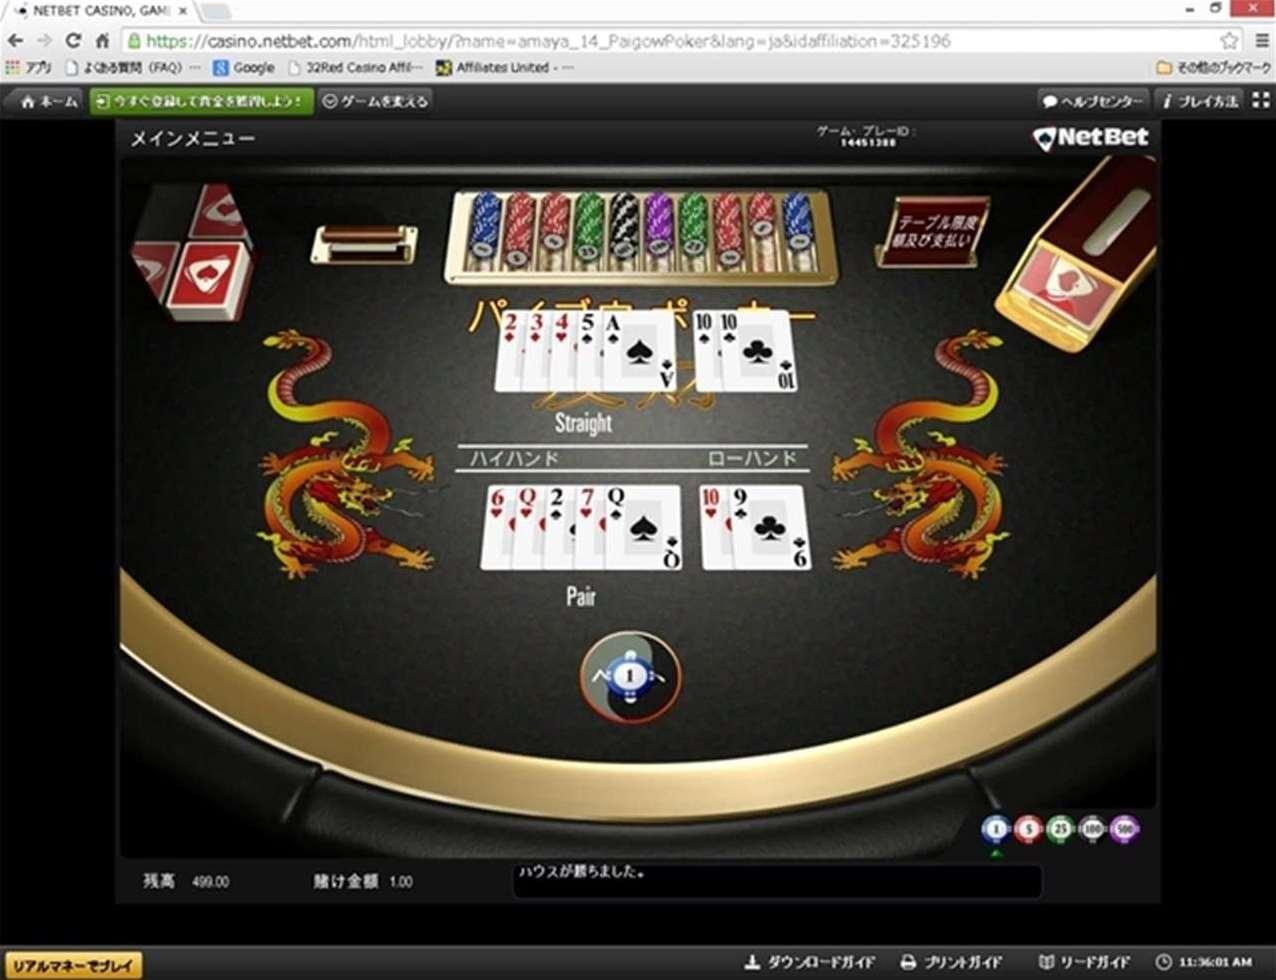 Net Bet Paigow Poker